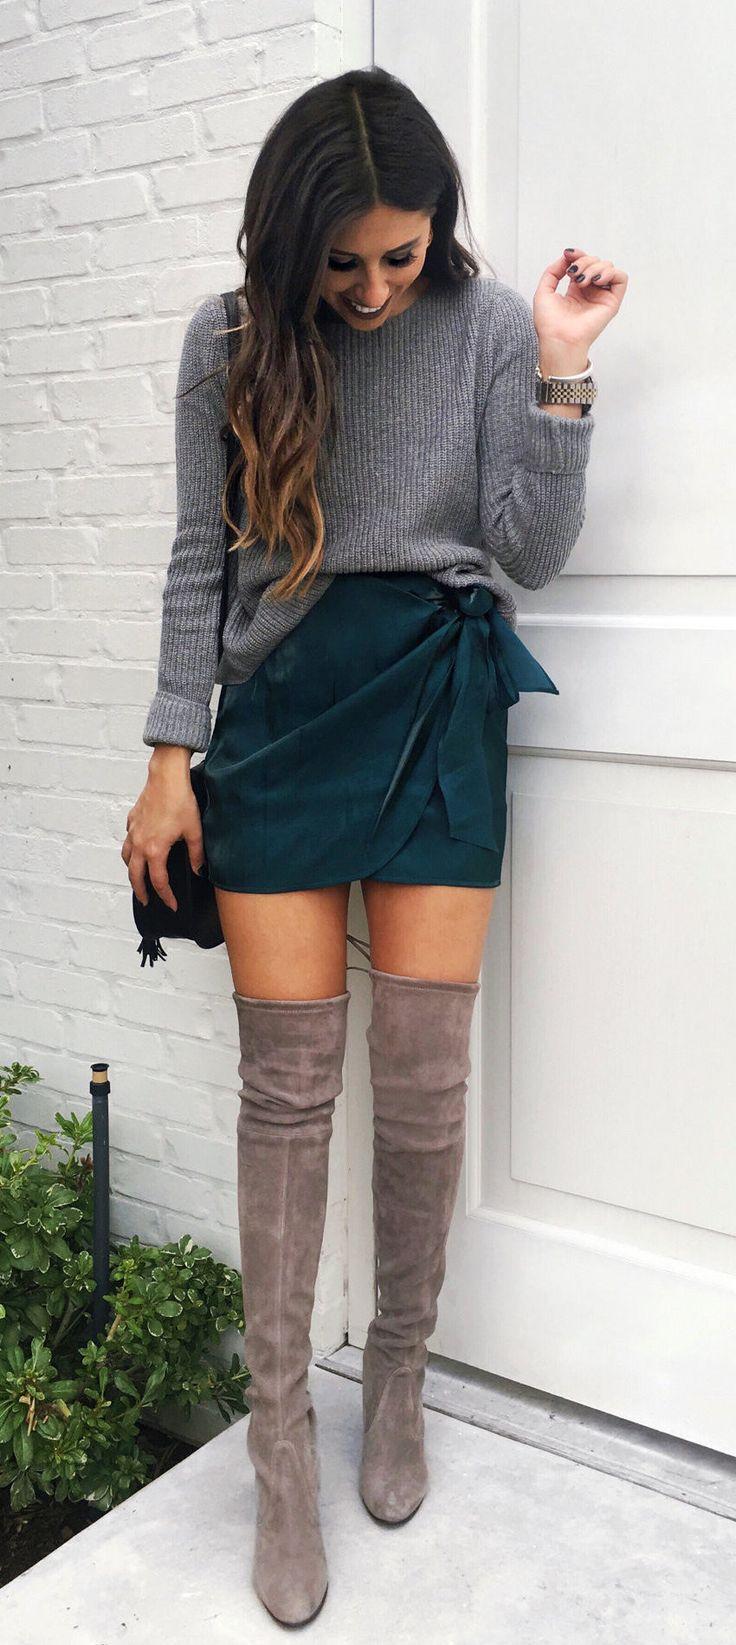 #winter #outfits green skirt